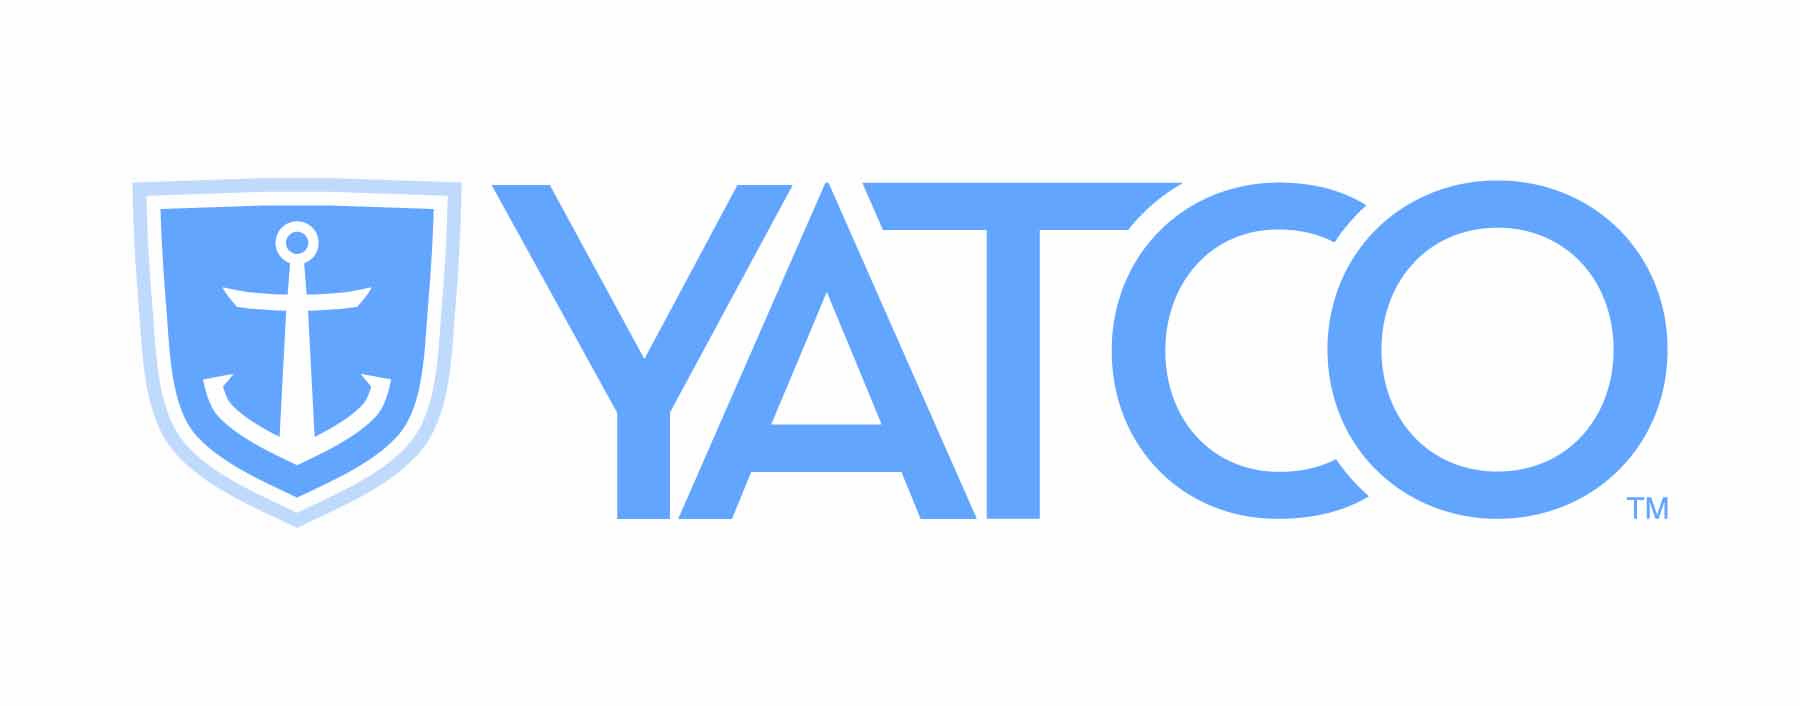 Yatco logo